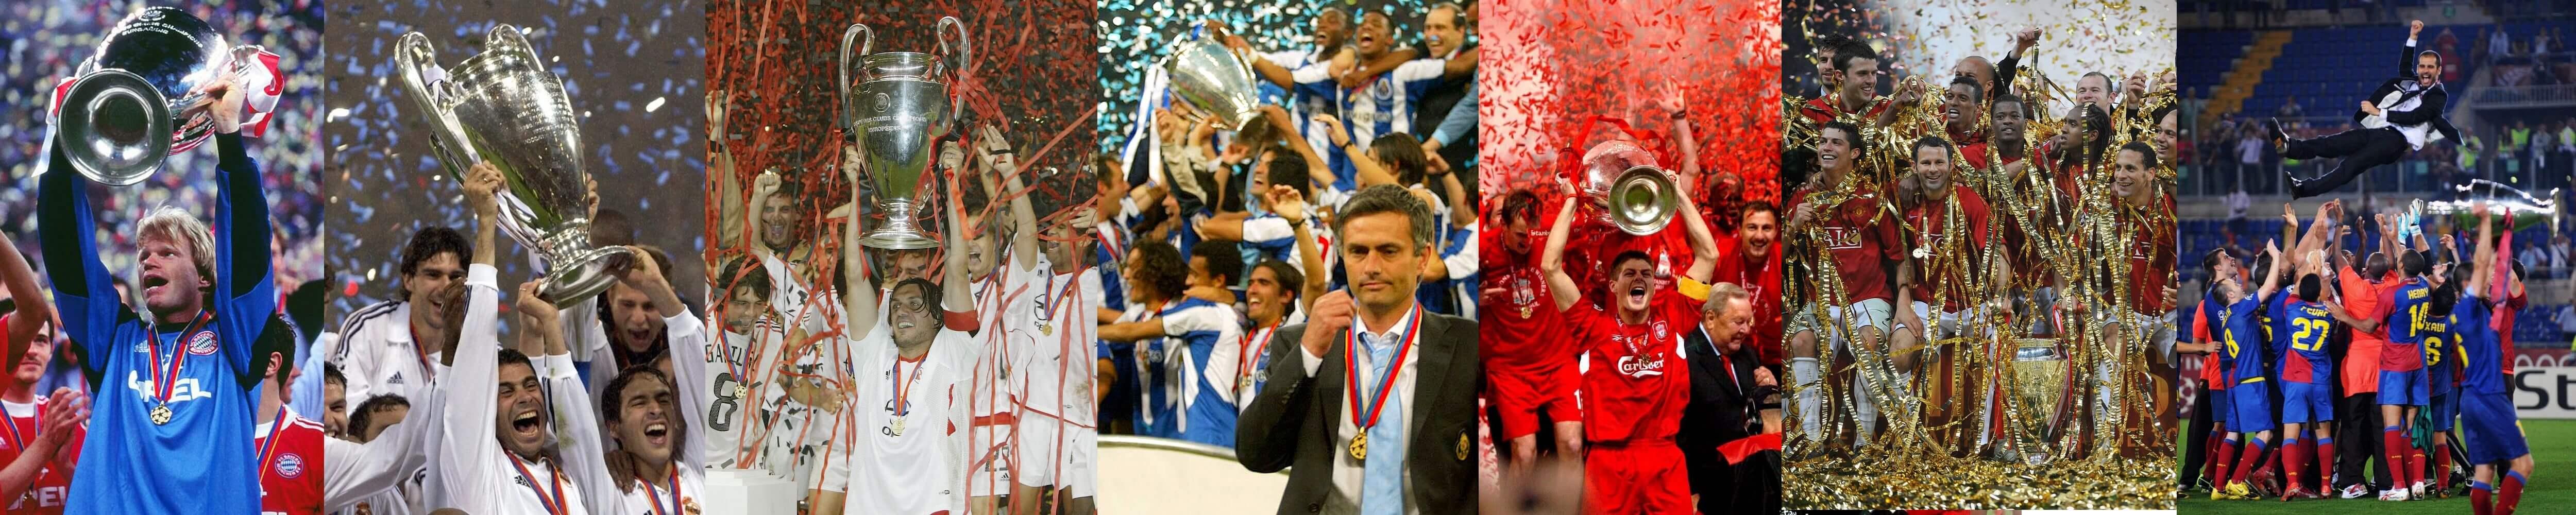 Champions League winners 2000s